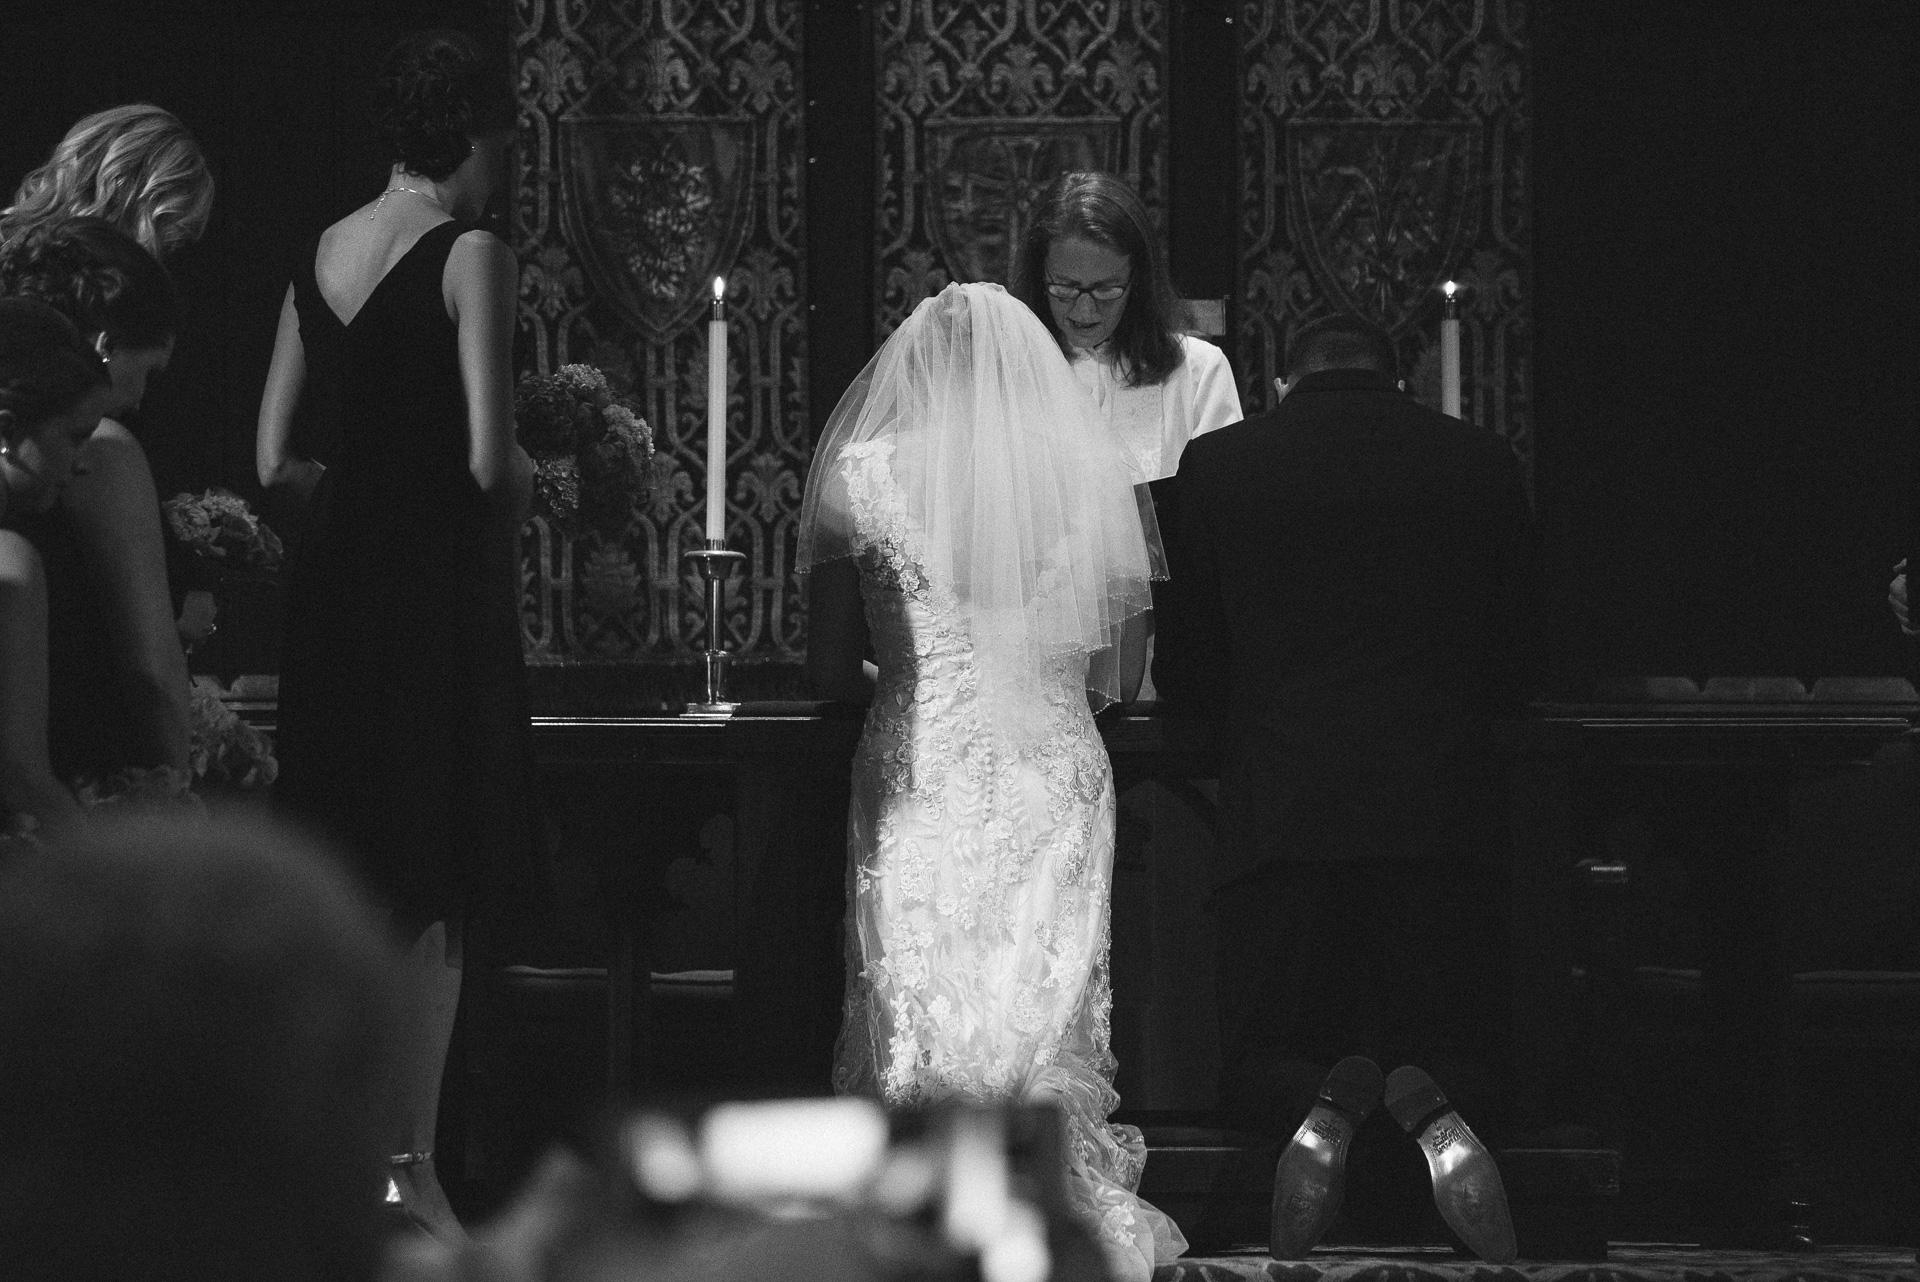 Dayton Wedding Photographer - Bride and Groom Pray